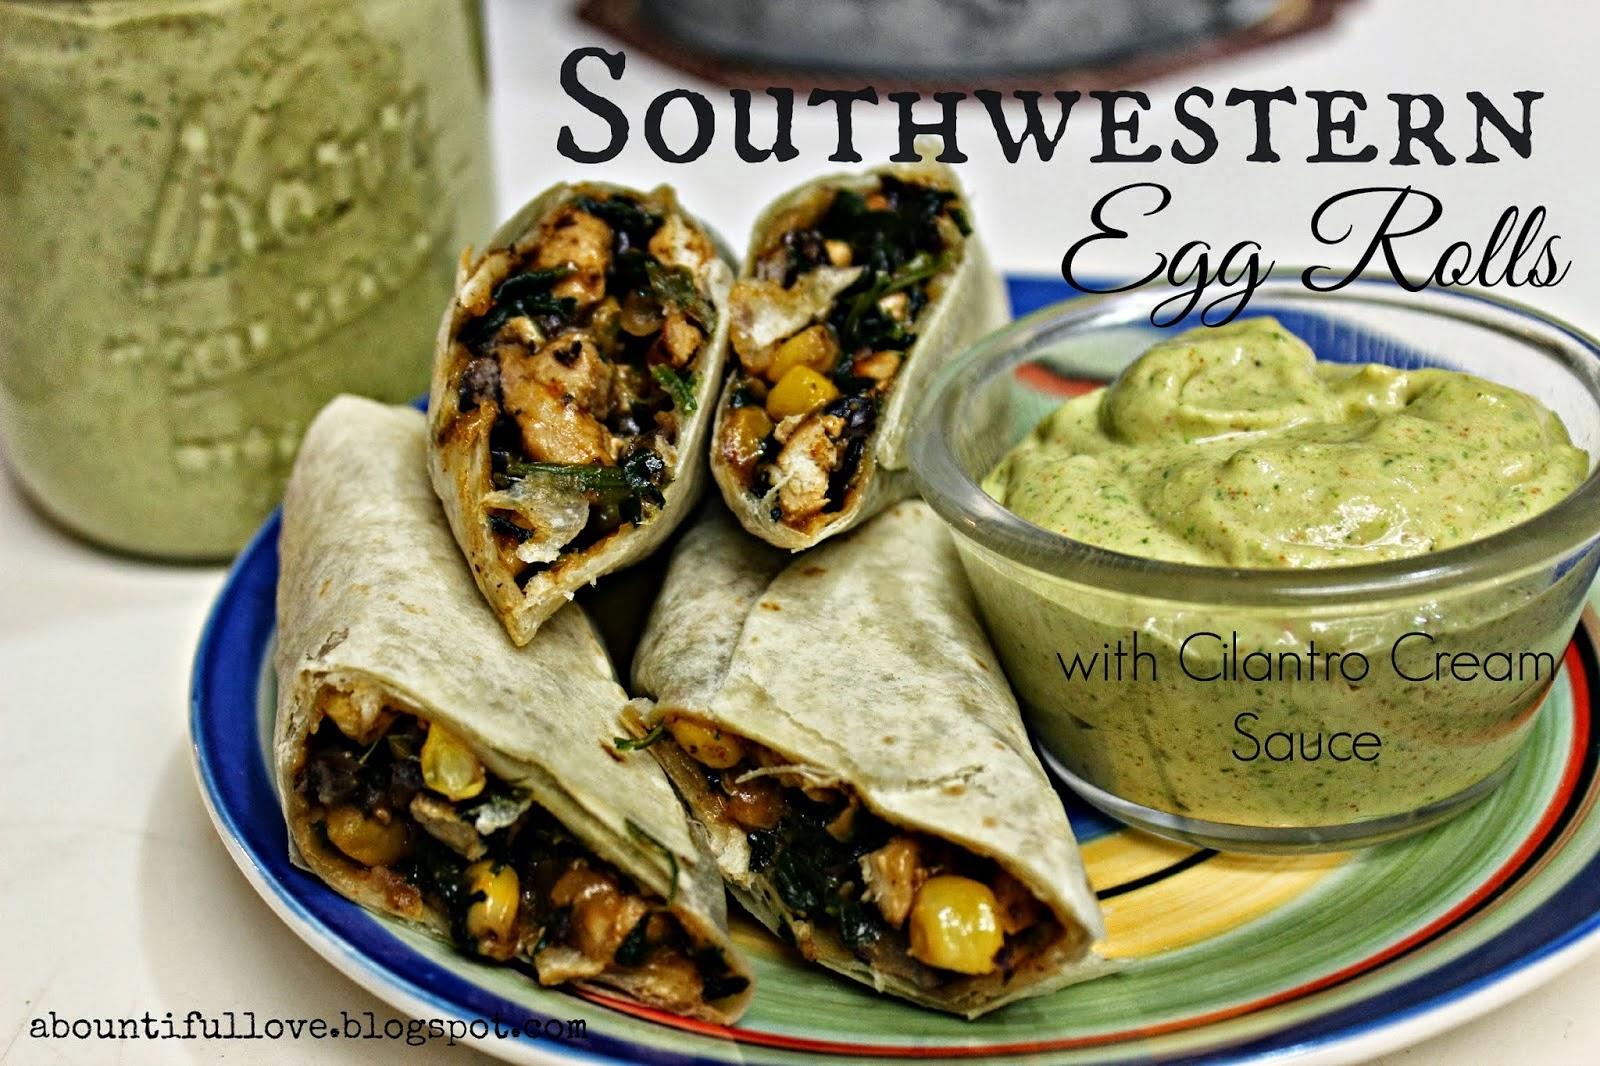 http://abountifullove.blogspot.com/2014/03/southwestern-egg-rolls.html